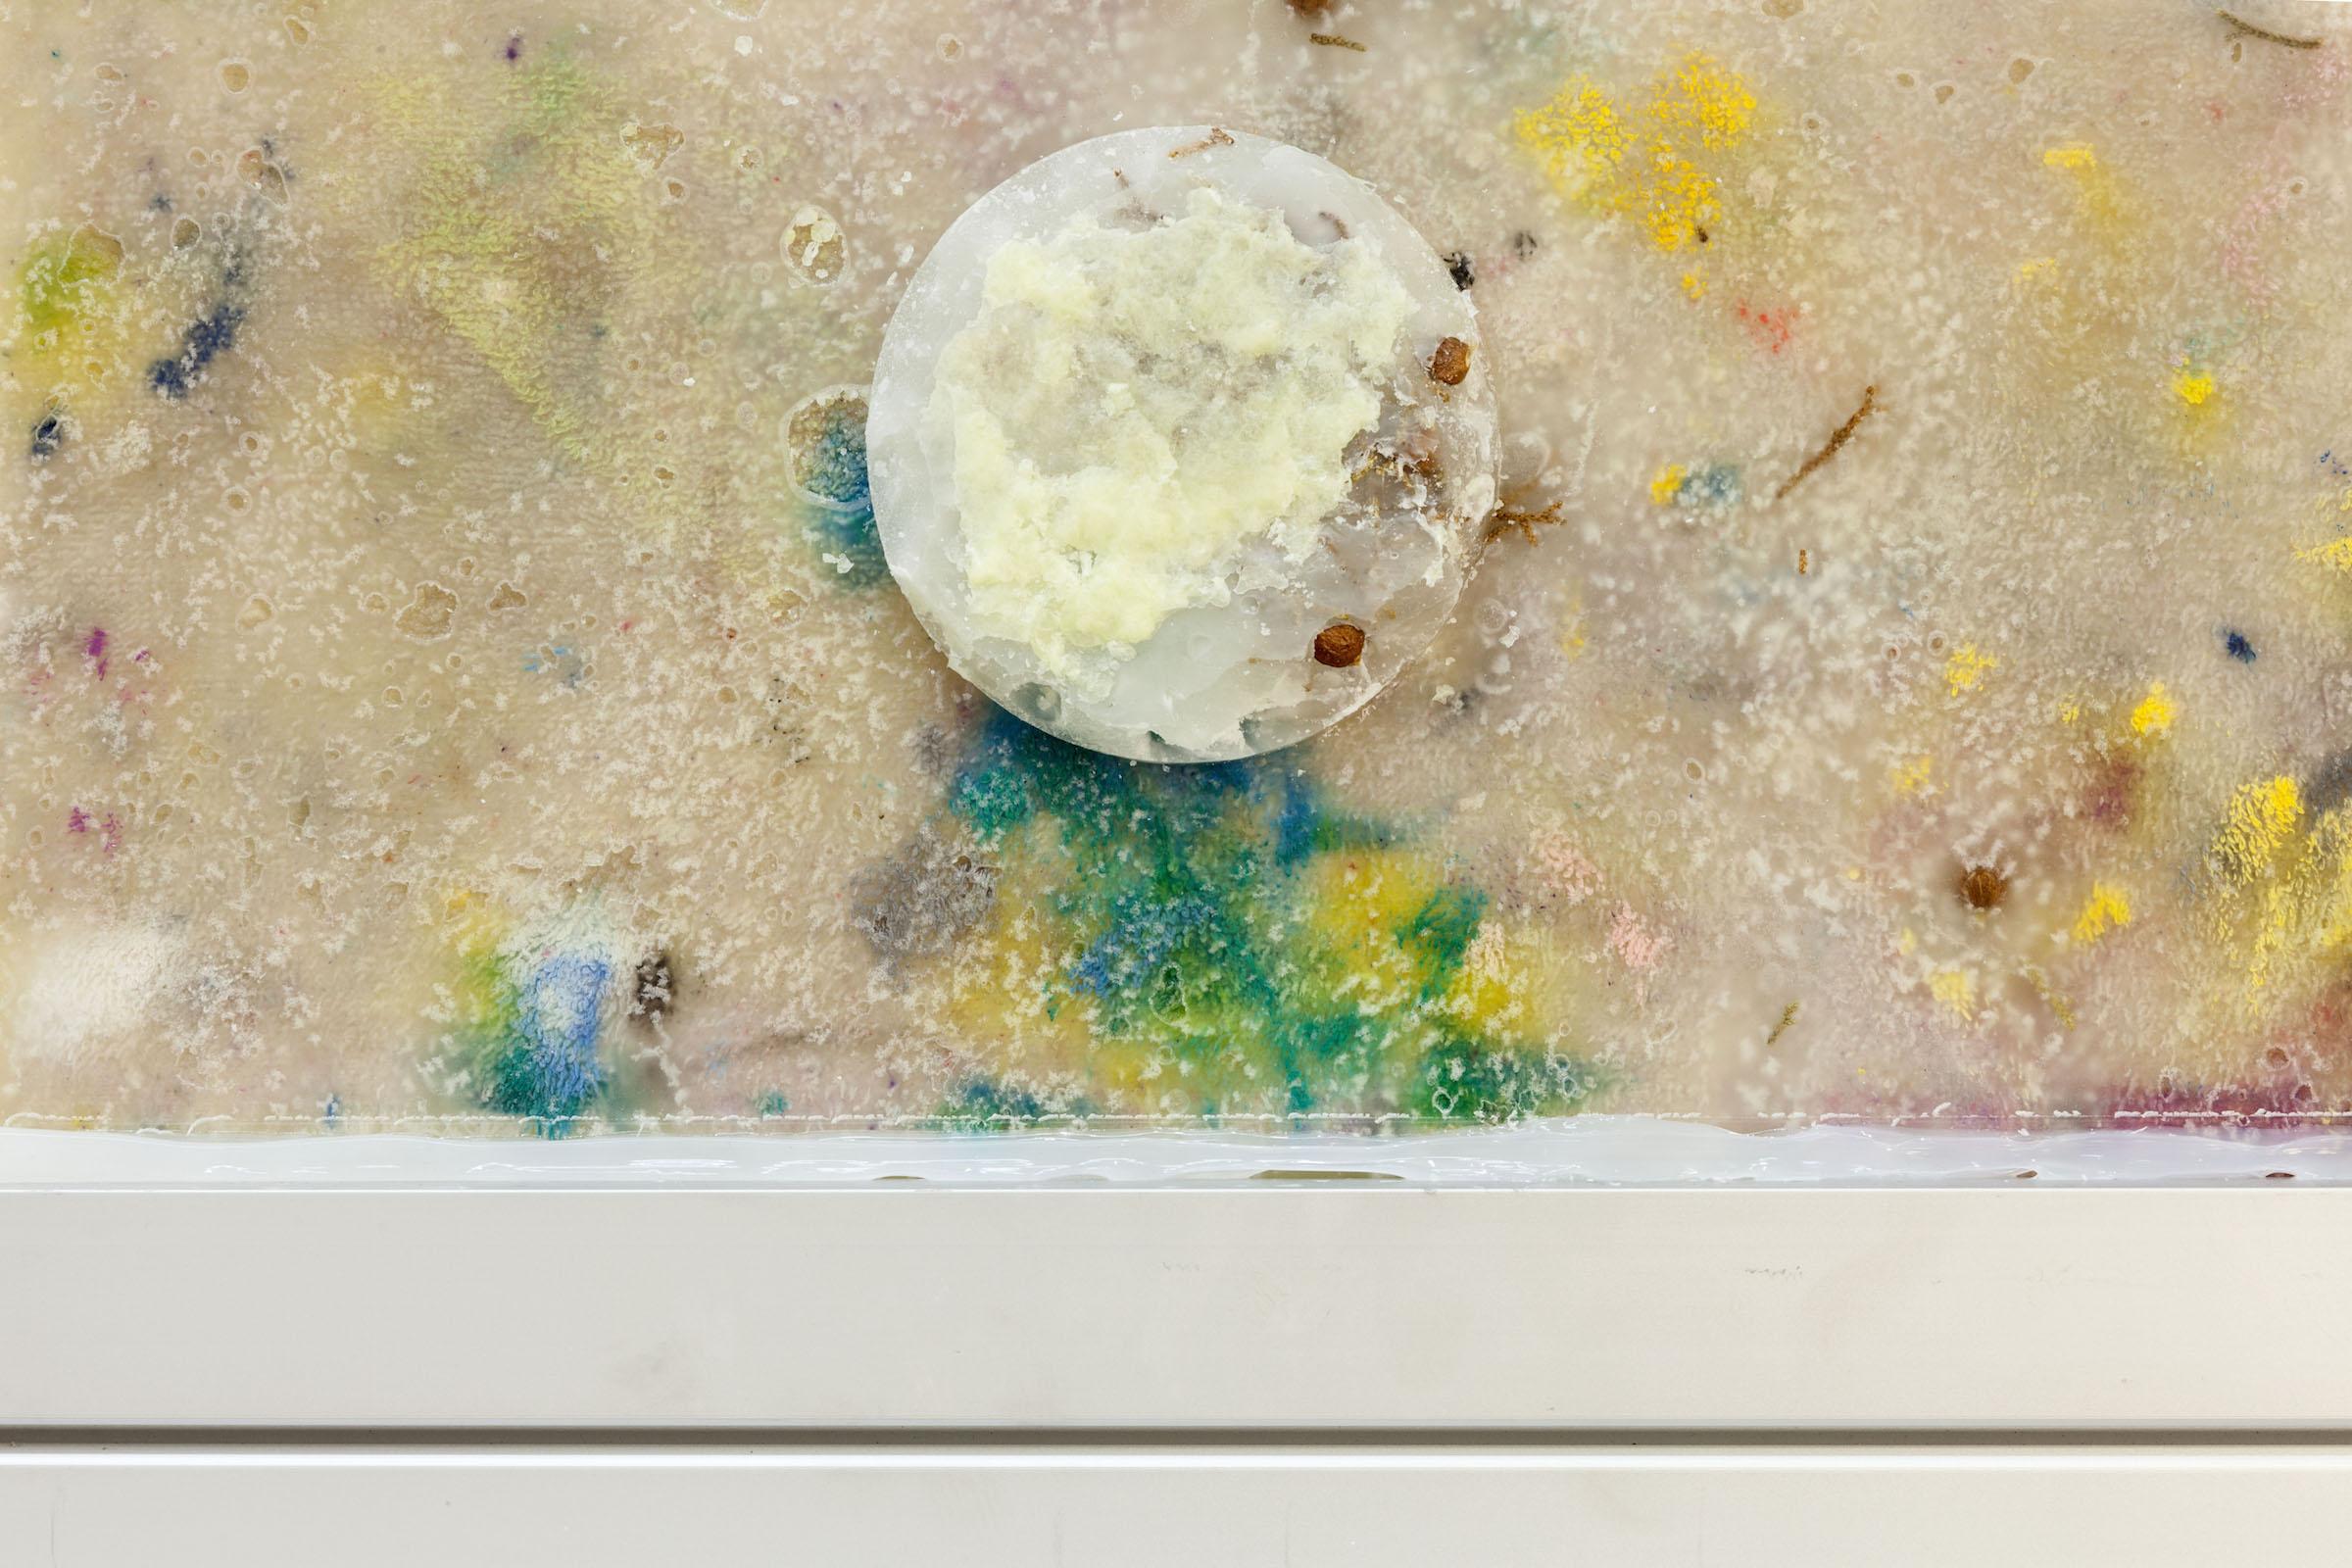 Natalie Labriola, Pharmakon I  (deatil), 2016,juniper berries and painted rag cast in paraffin wax, silicone caulk, aluminum hardware,15 x 24.25 x 4 in